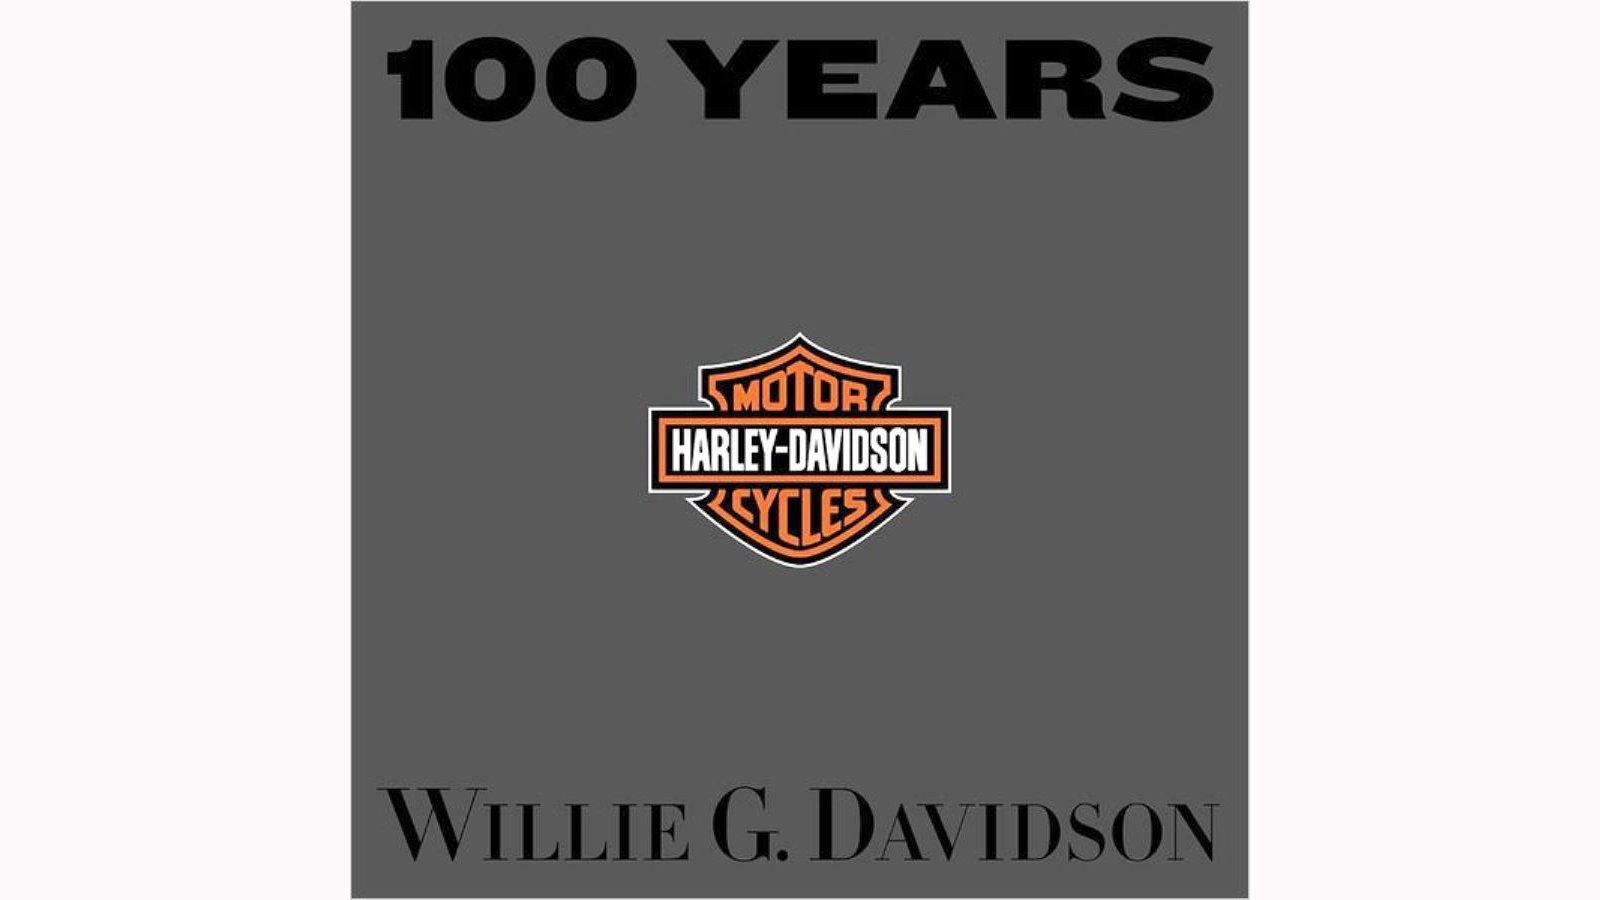 100 Years of Harley Davidson - Willie G. Davidson